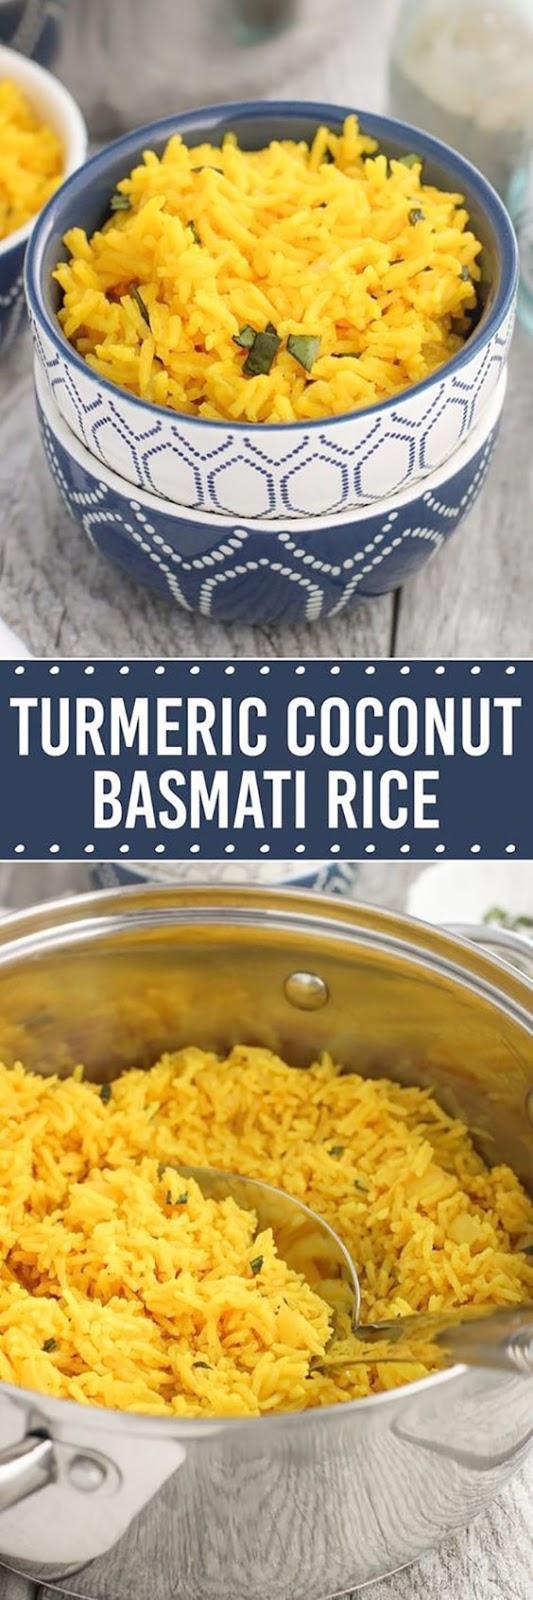 Turmeric Coconut Basmati Rice